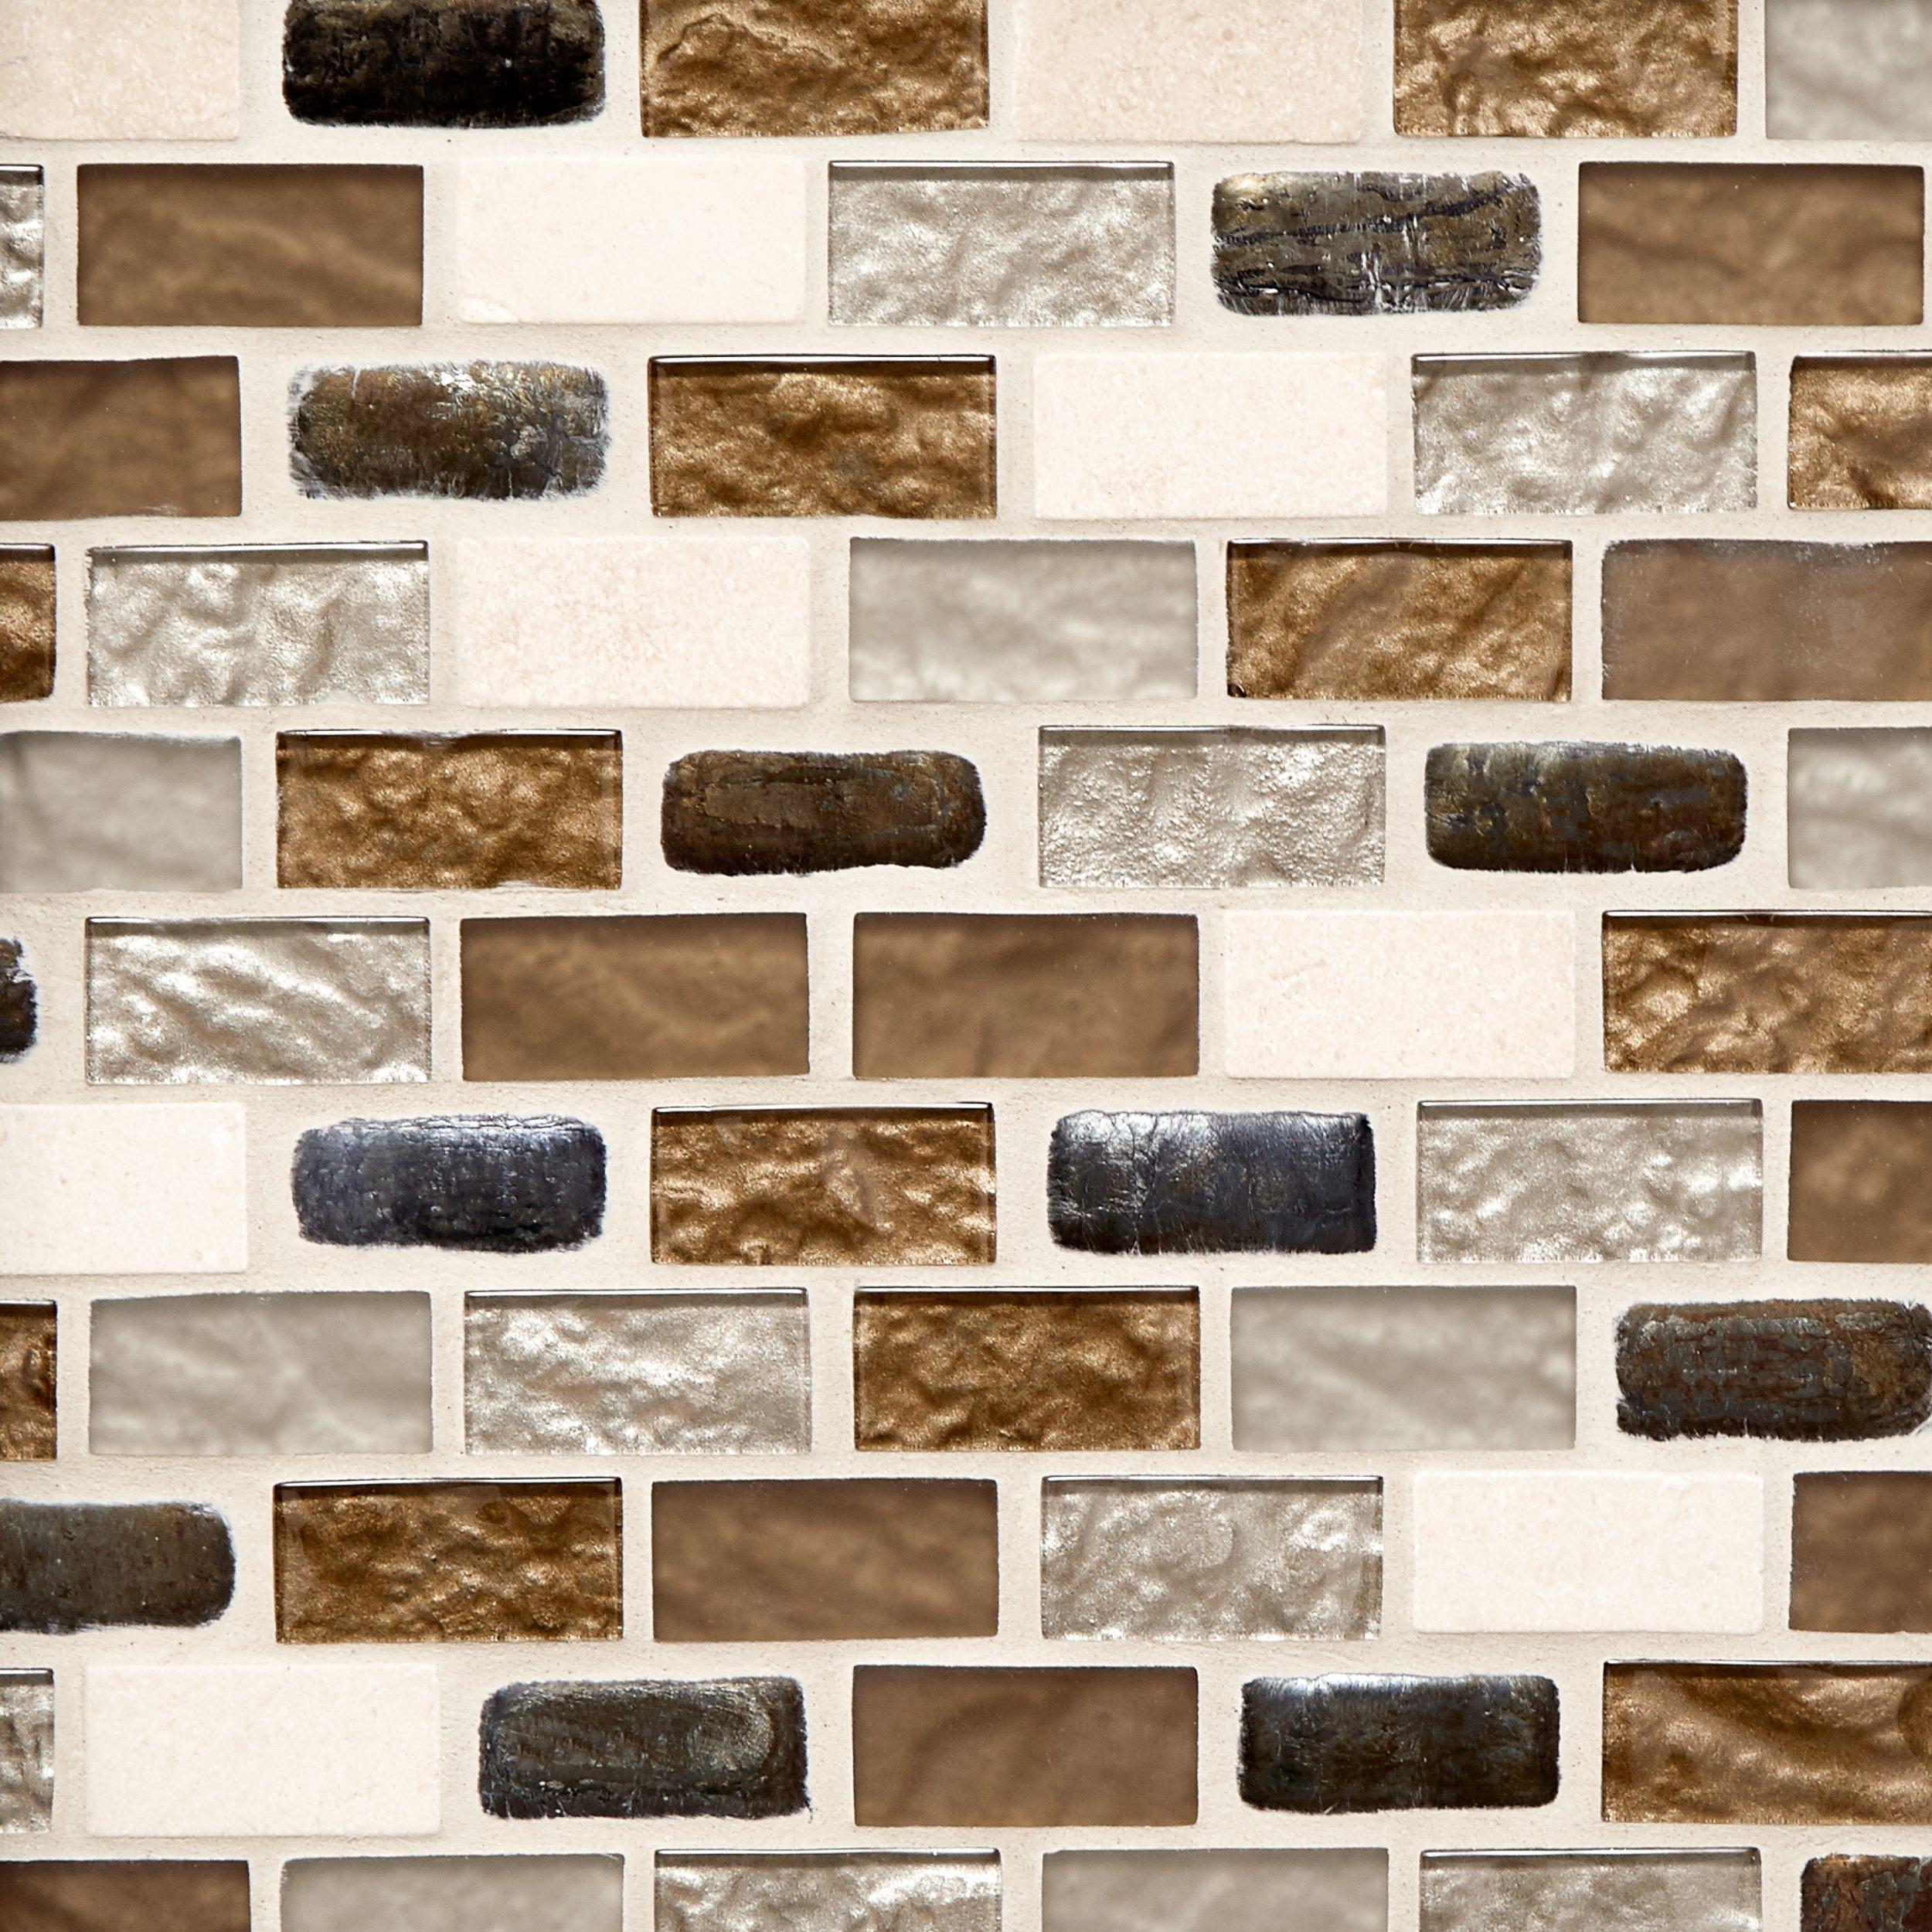 glass and travertine mix brick glass mosaic 11 x 13 100084417 rh flooranddecor com Ivory Travertine Backsplash Ivory Travertine Backsplash